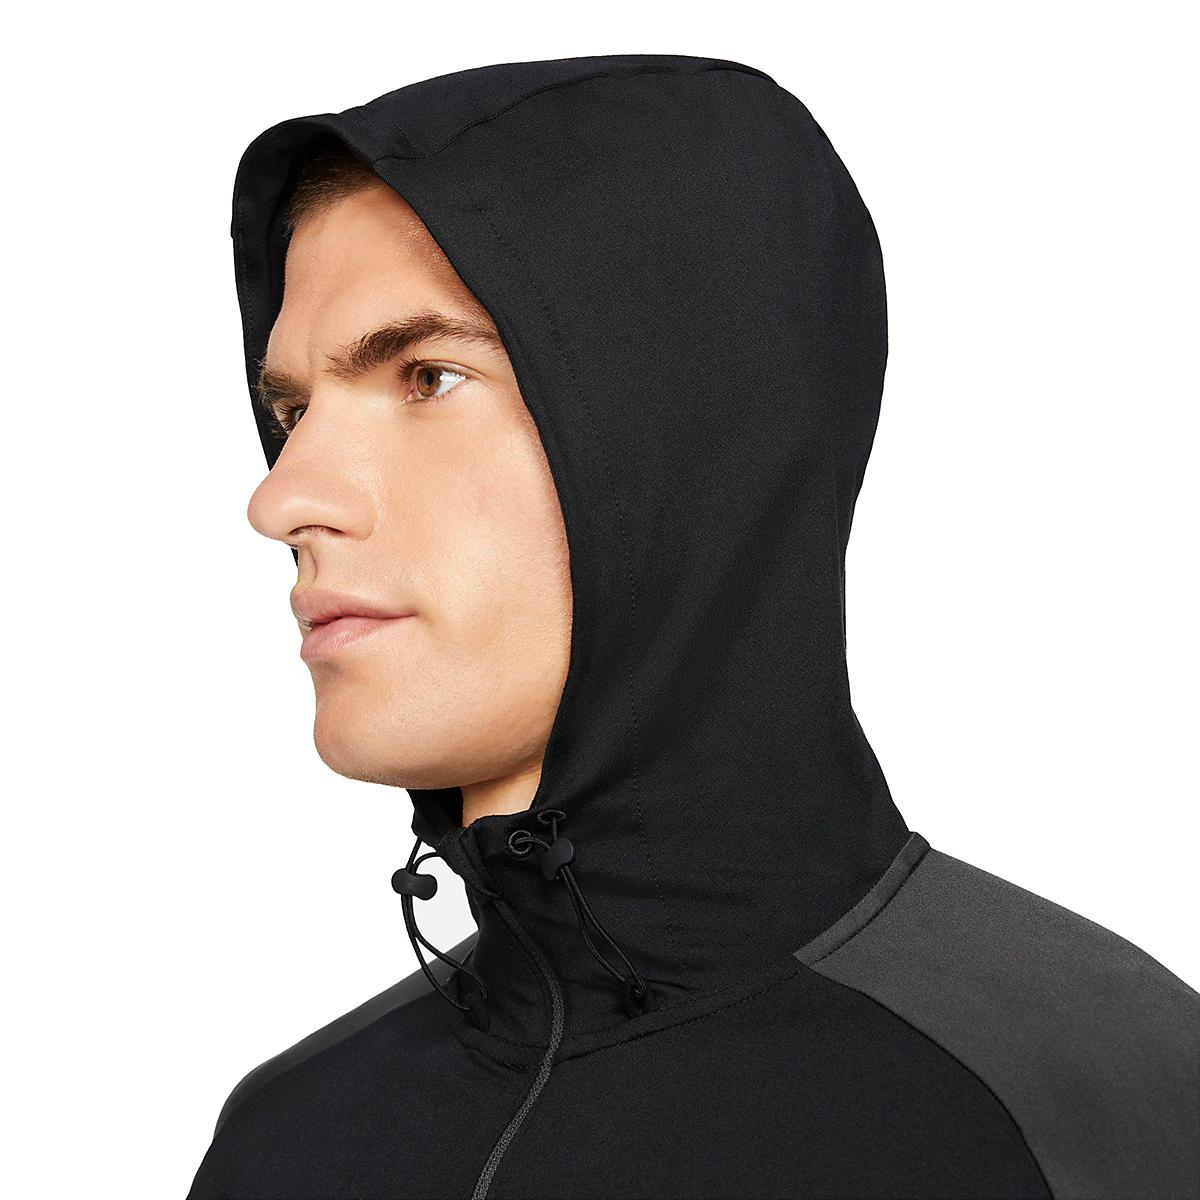 Men's Nike Dri-FIT Element 1/2-Zip Trail Running Top - Color: Black/Black/Dark Smoke Grey/White - Size: XS, Black/Black/Dark Smoke Grey/White, large, image 3